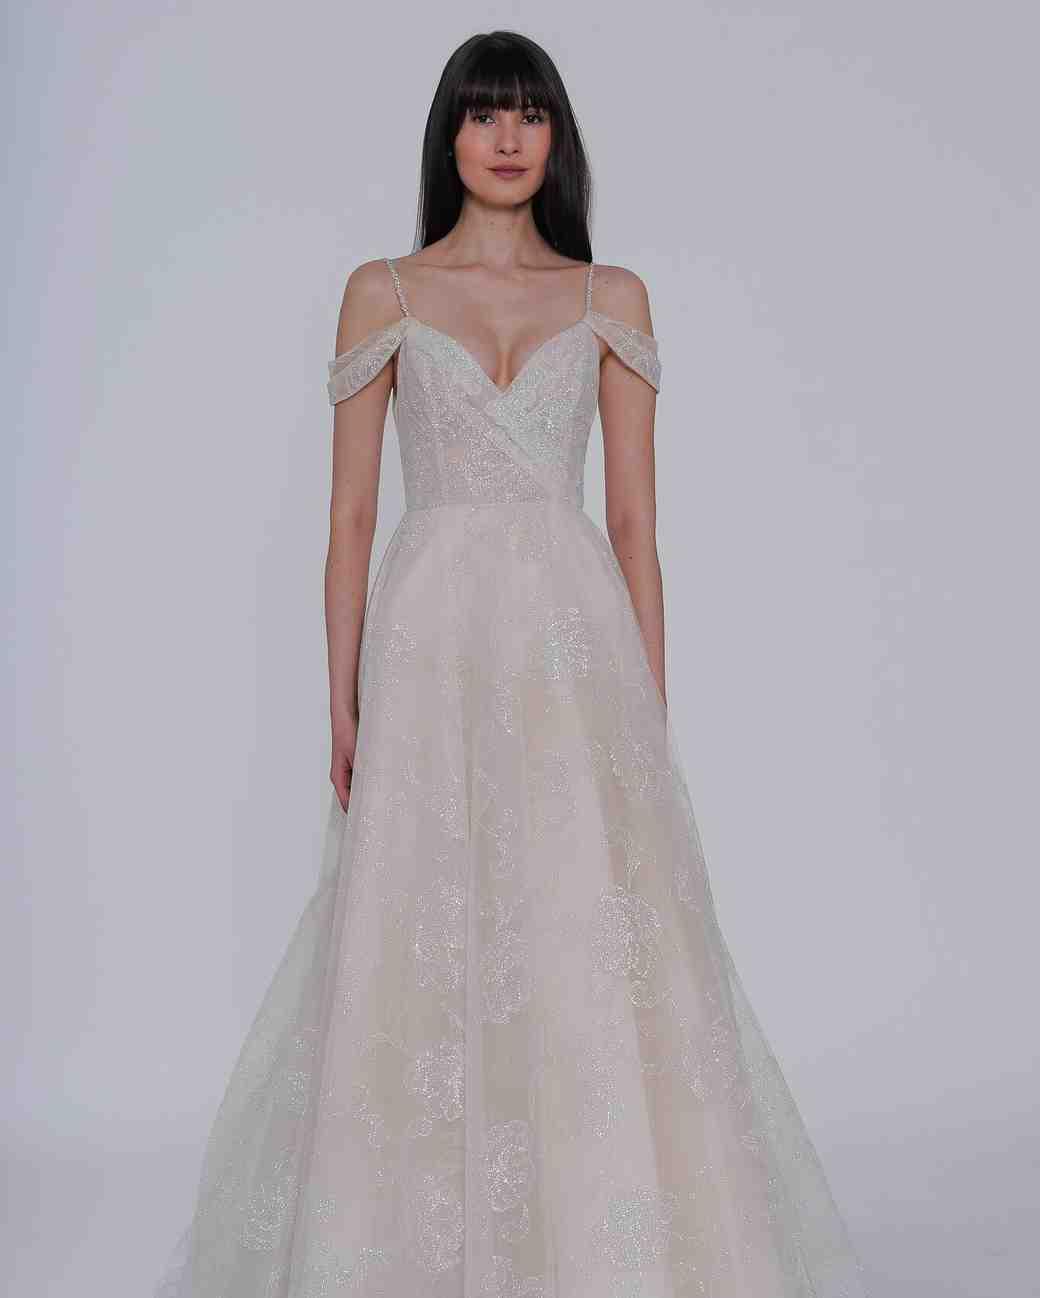 2019 Spring Wedding Dresses By Lazaro